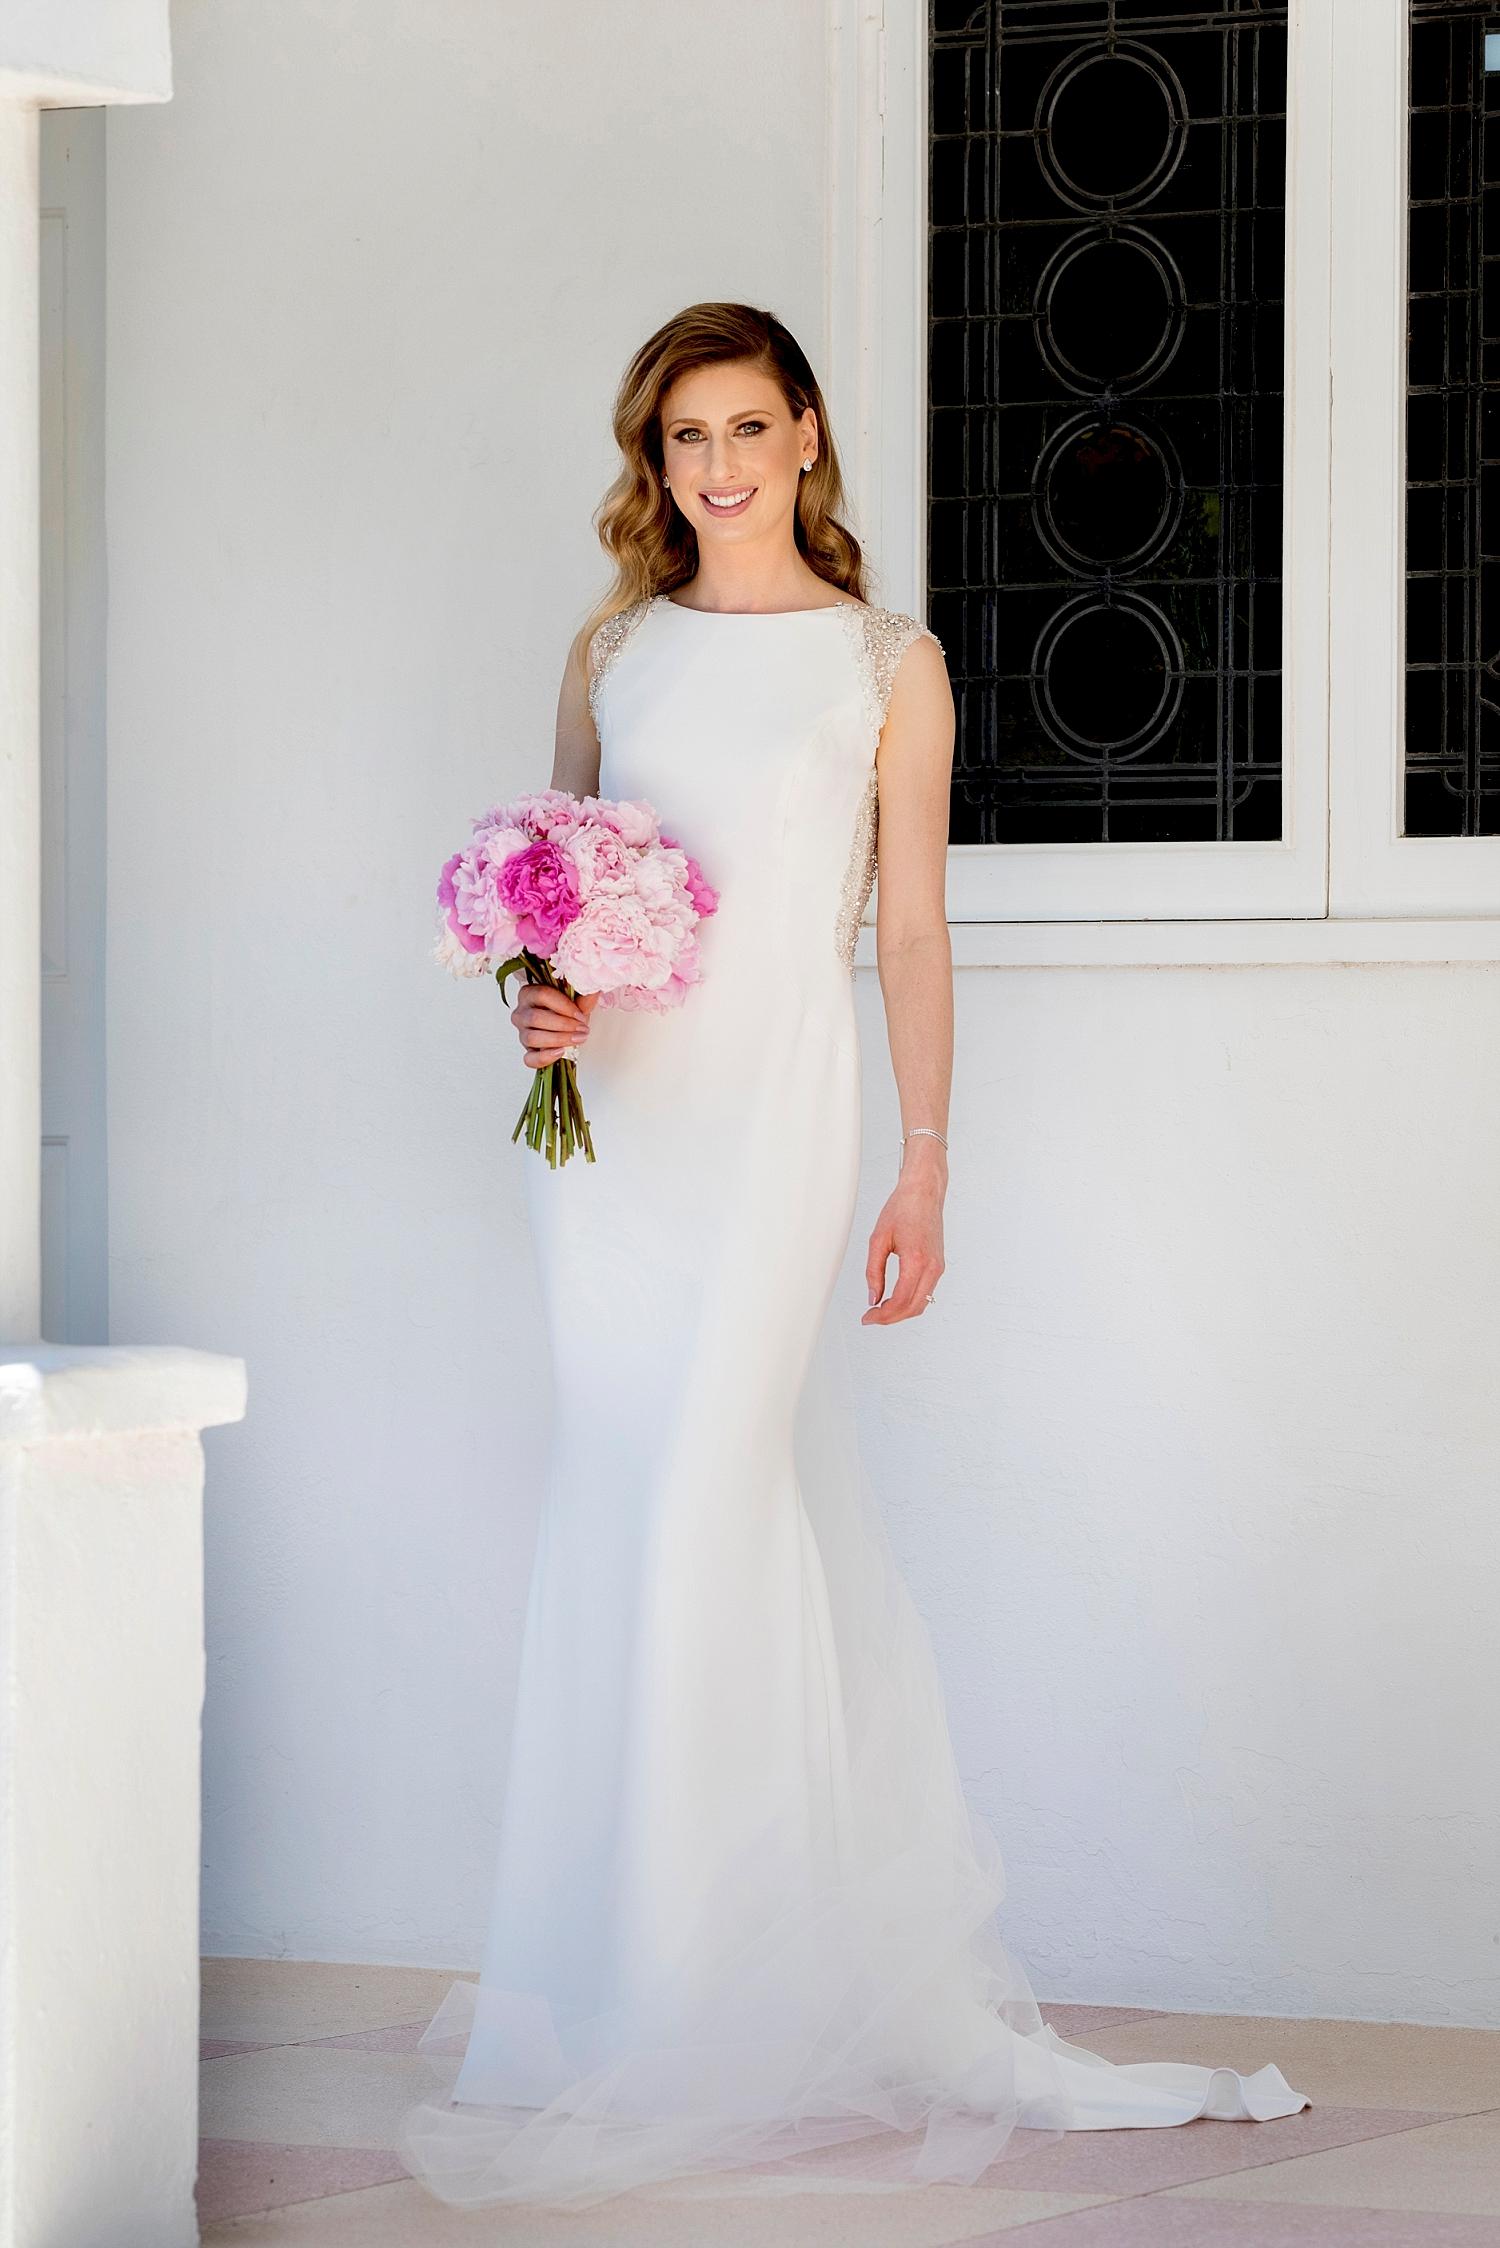 49_perth wedding photographer deray simcoe .jpg